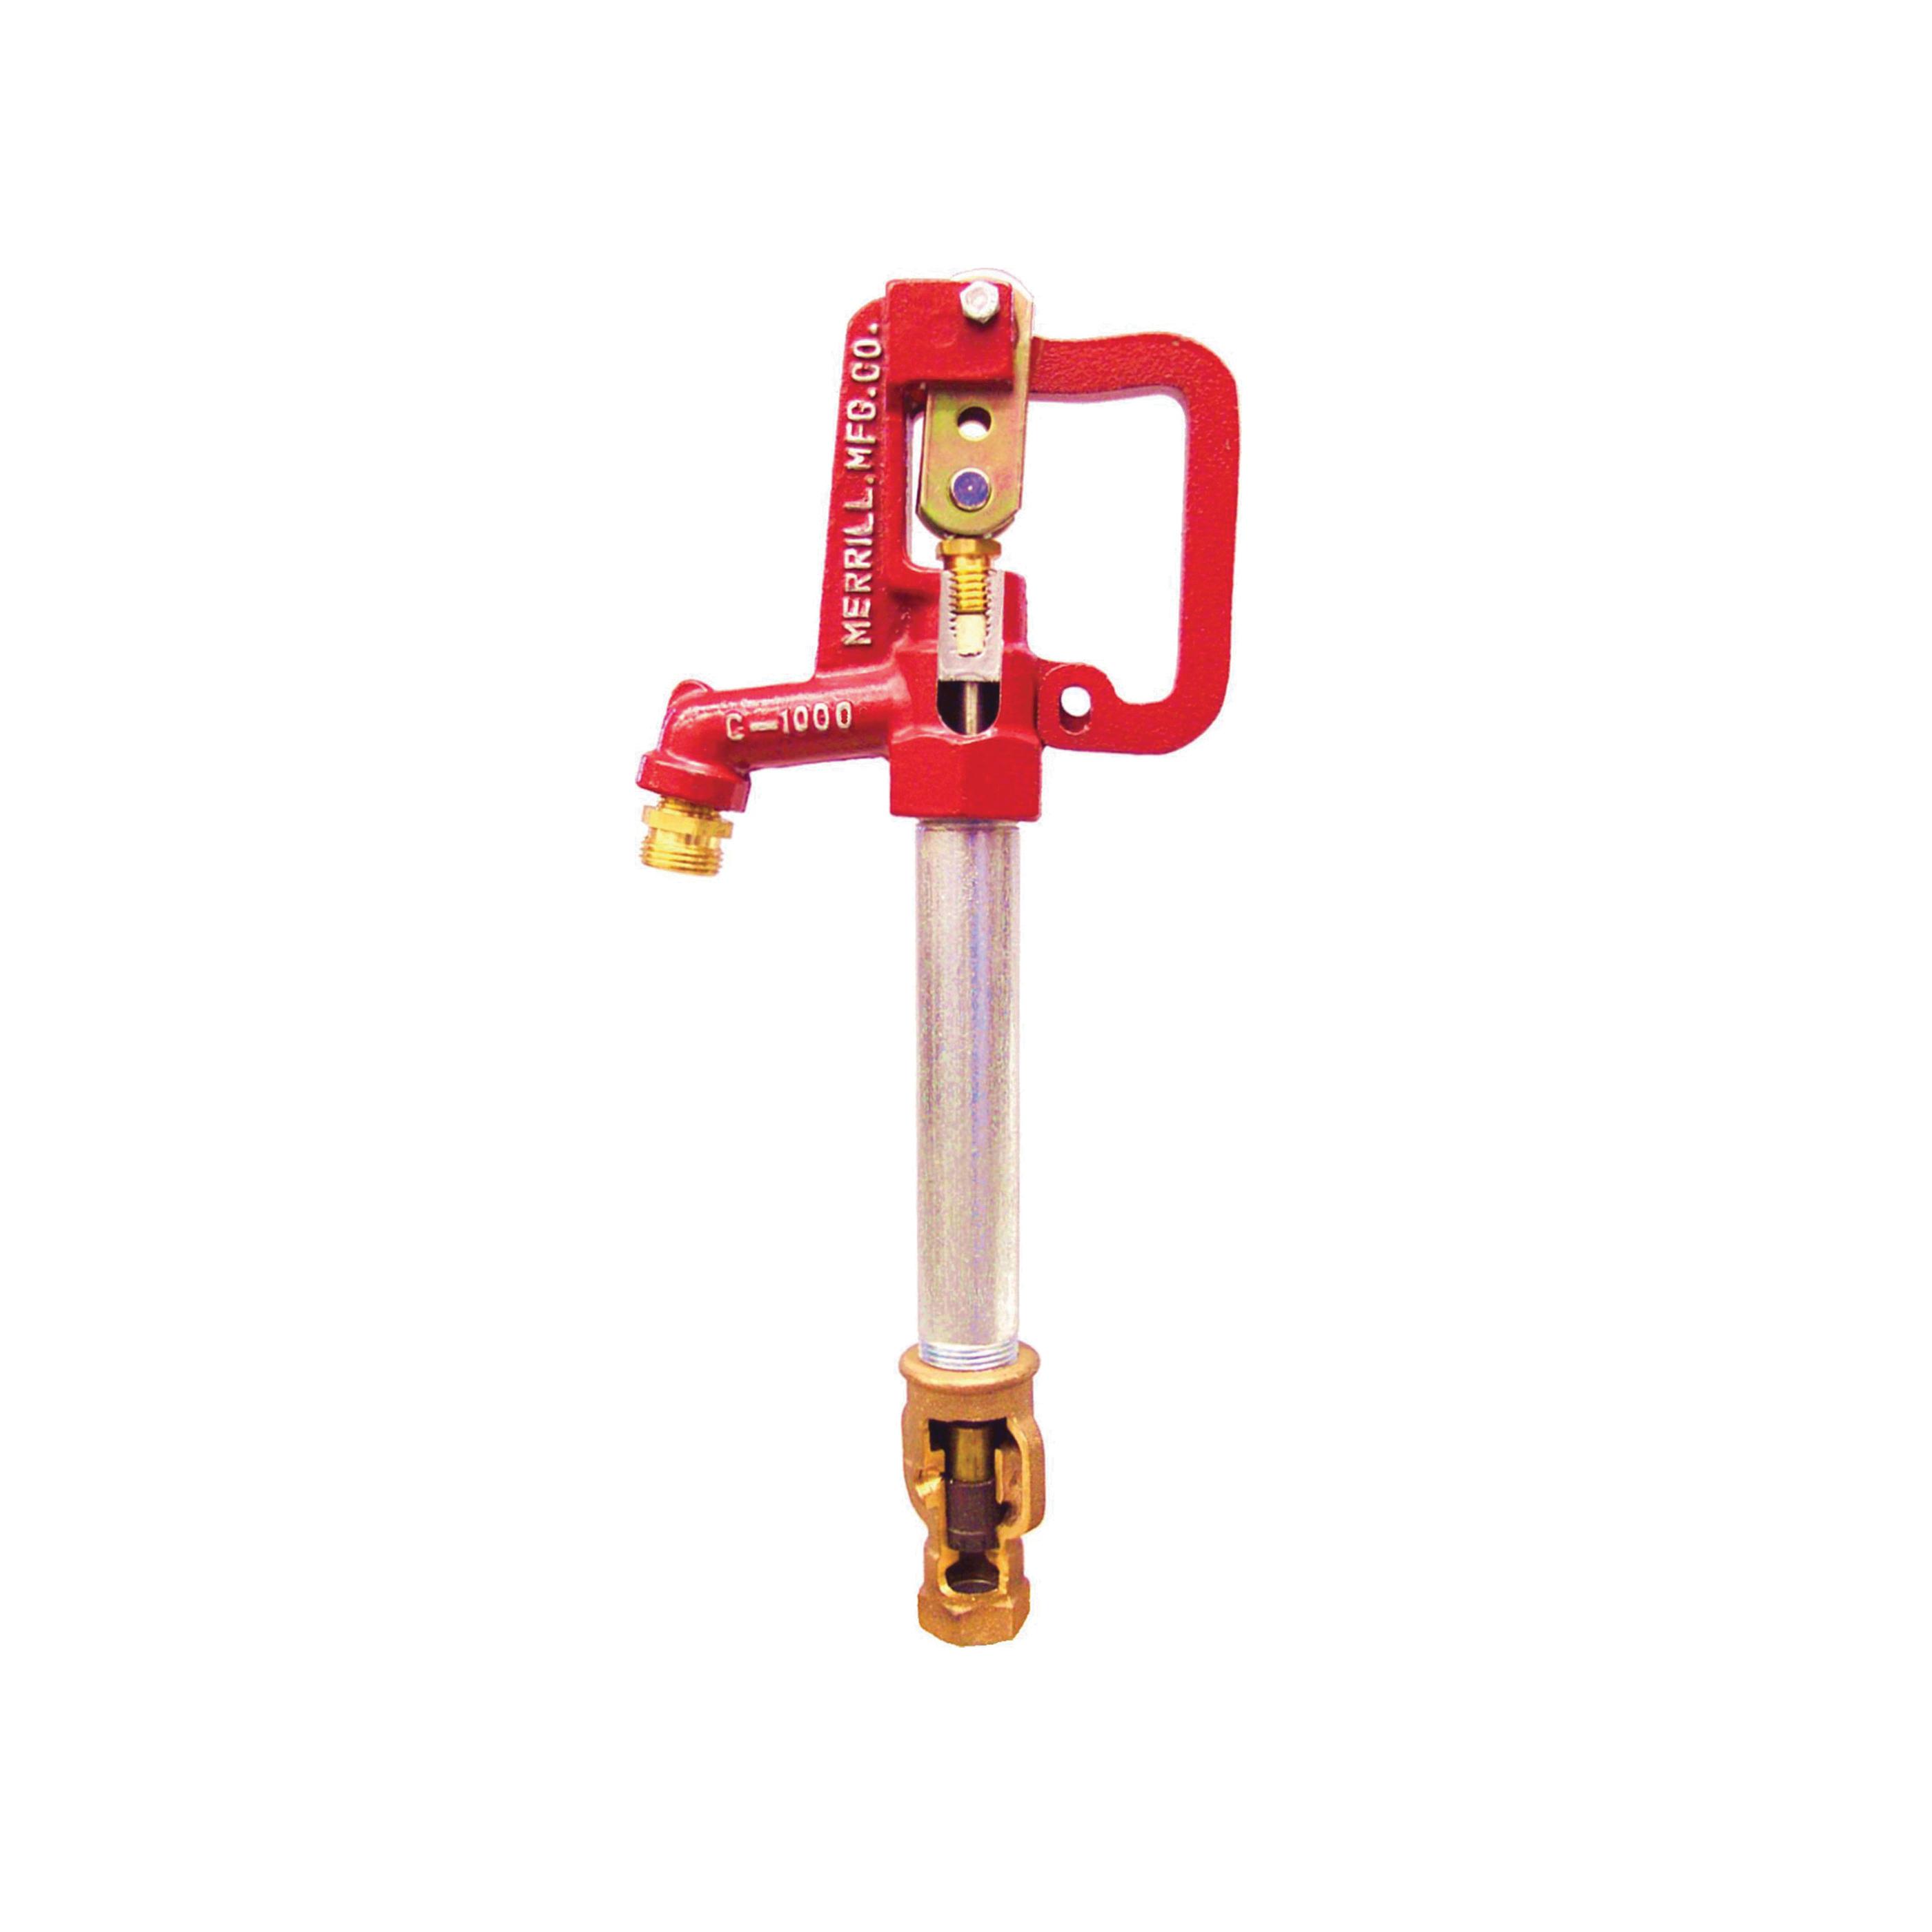 Merrill™ C7502 C-1000 Hi-Capacity Frost-Proof Yard Hydrant, 3/4 in, NPT x Hose Thread, 2 ft D Bury, 56-1/2 in OAL, Lever Handle Shut-Off, Domestic